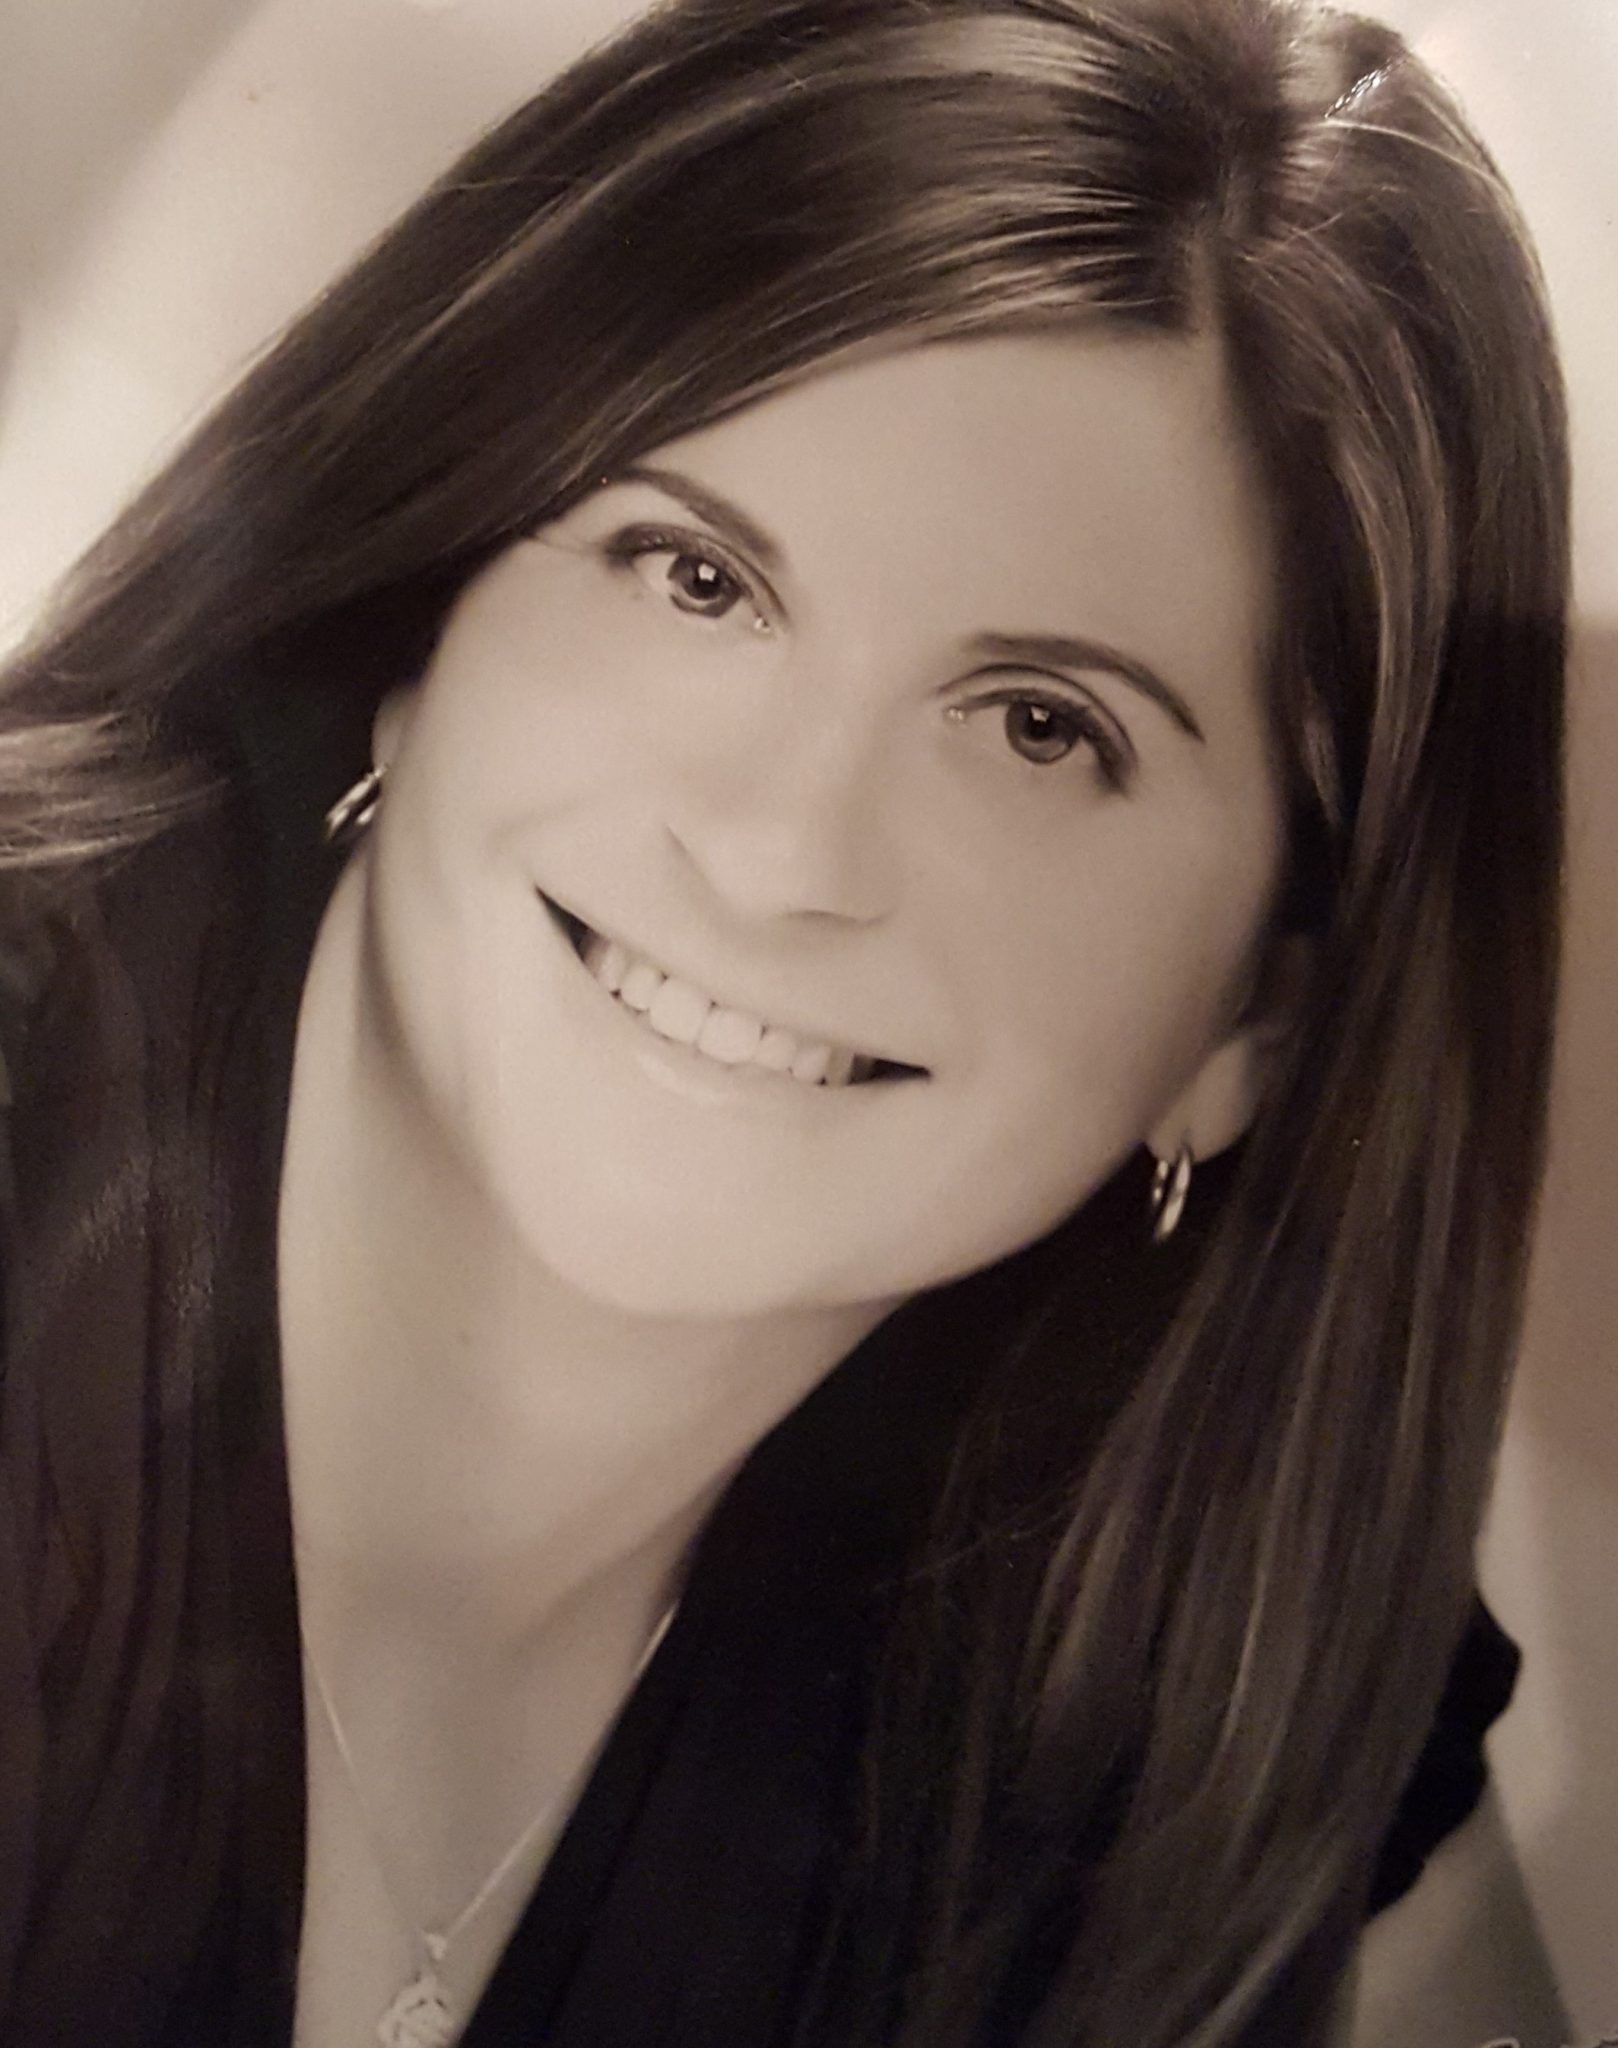 Valerie Landry, Director of Sales